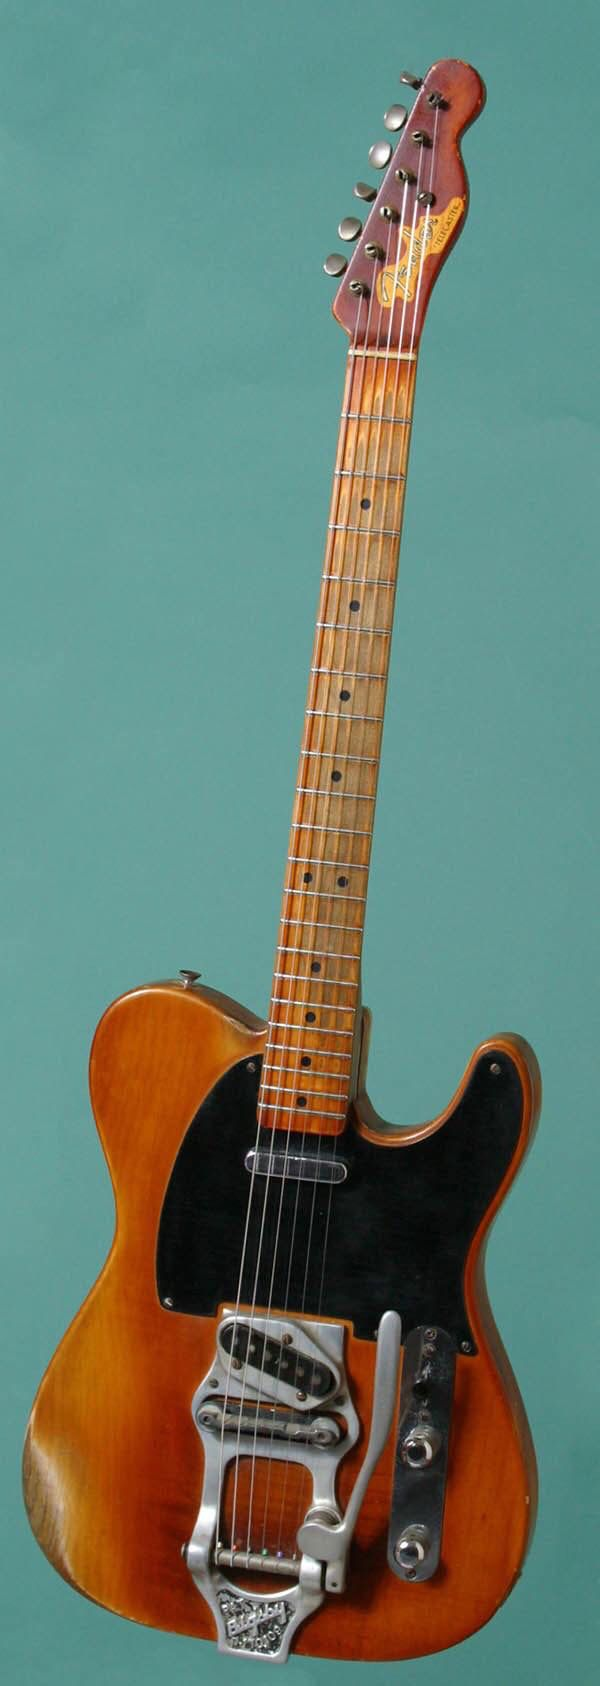 165 best Vintage Guitars / Customs images on Pinterest | Bass ...